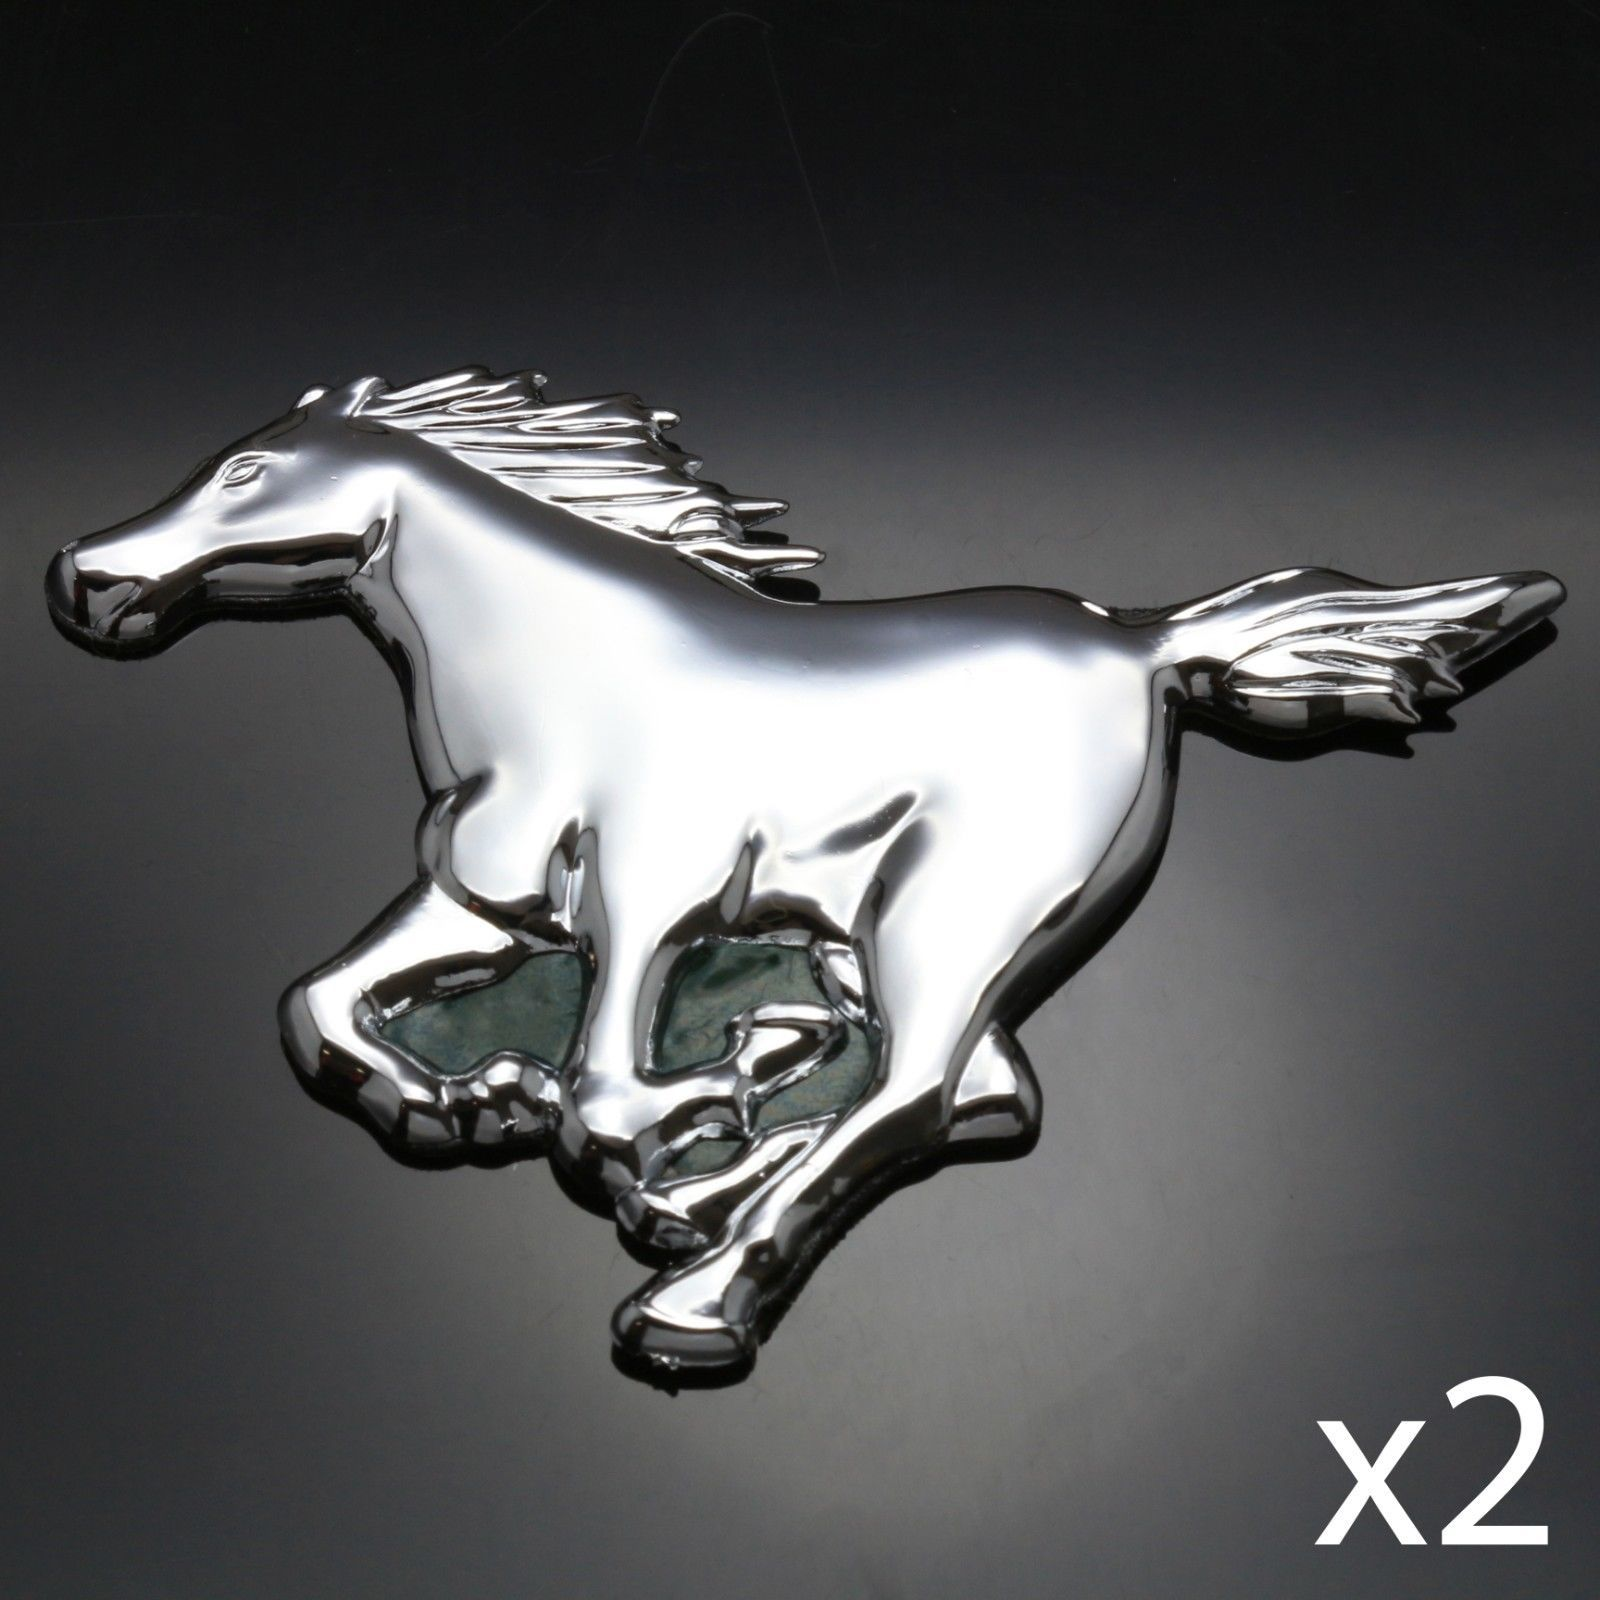 2x chrome 3d car badge mustang horse power emblem sticker decal 2x chrome 3d car badge mustang horse power emblem sticker decal silver sign biocorpaavc Gallery